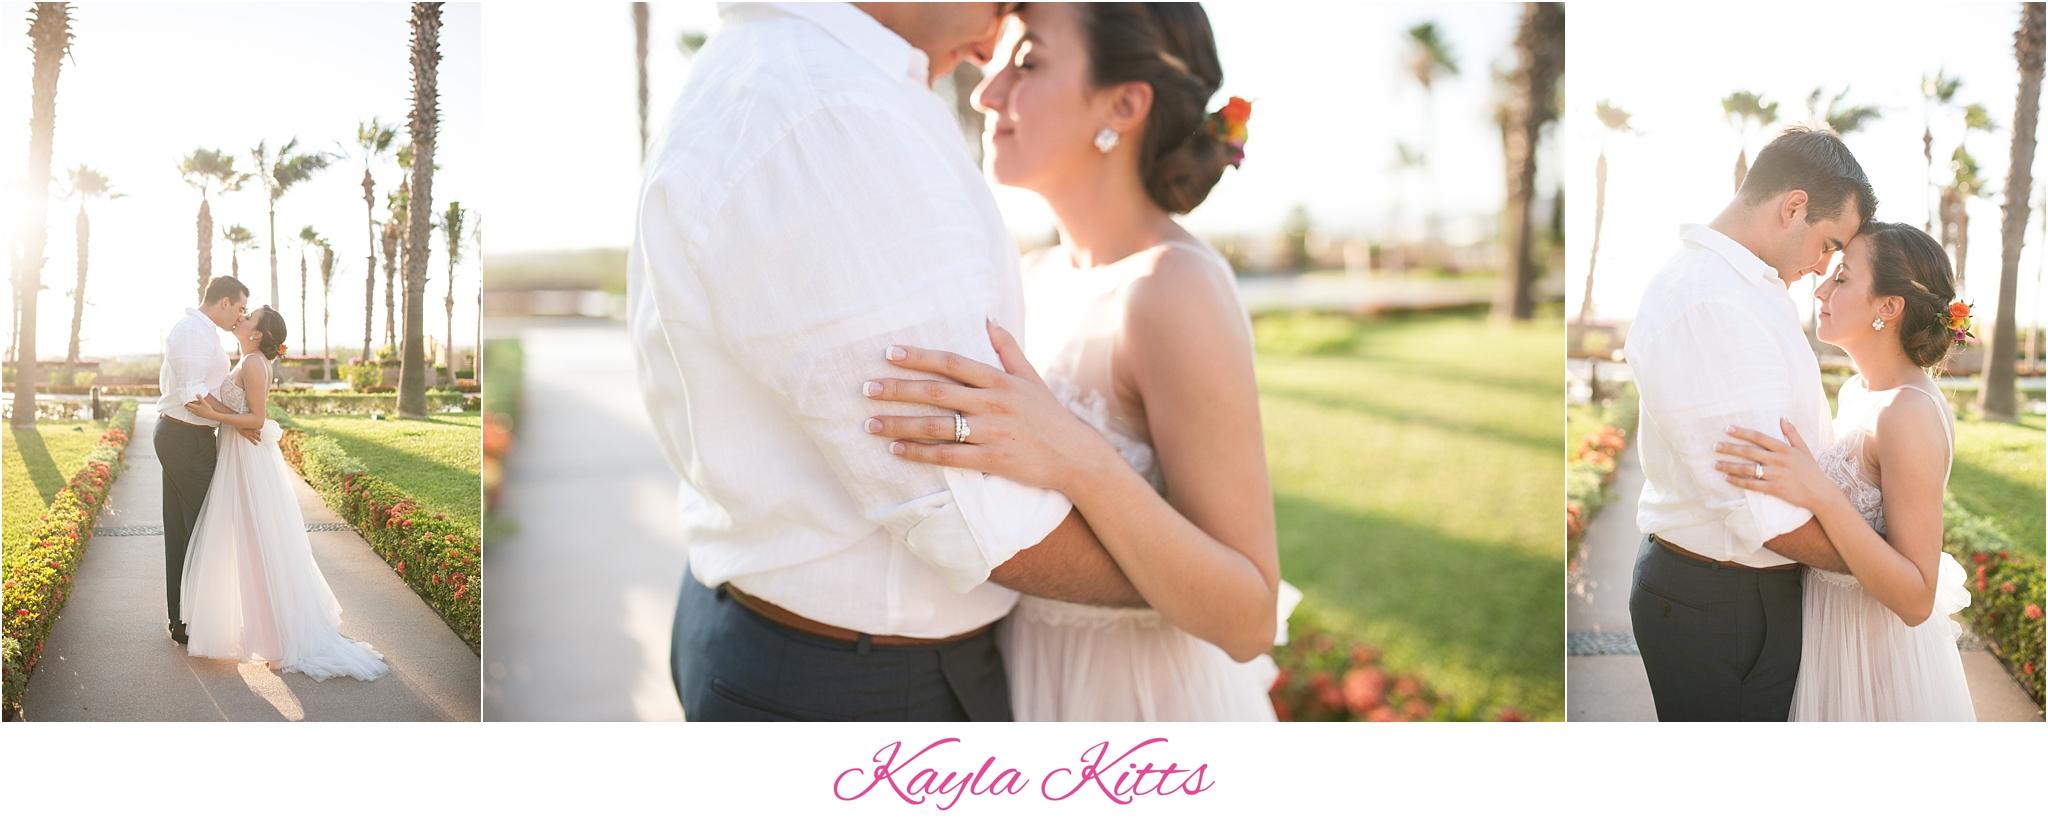 kayla kitts photography-travis and sarah-cabo wedding-cabo wedding photographer-destination wedding photographer-paris wedding photographer-albuquerque wedding-matt jones-albuquerque wedding vendor-intimate wedding_0025.jpg